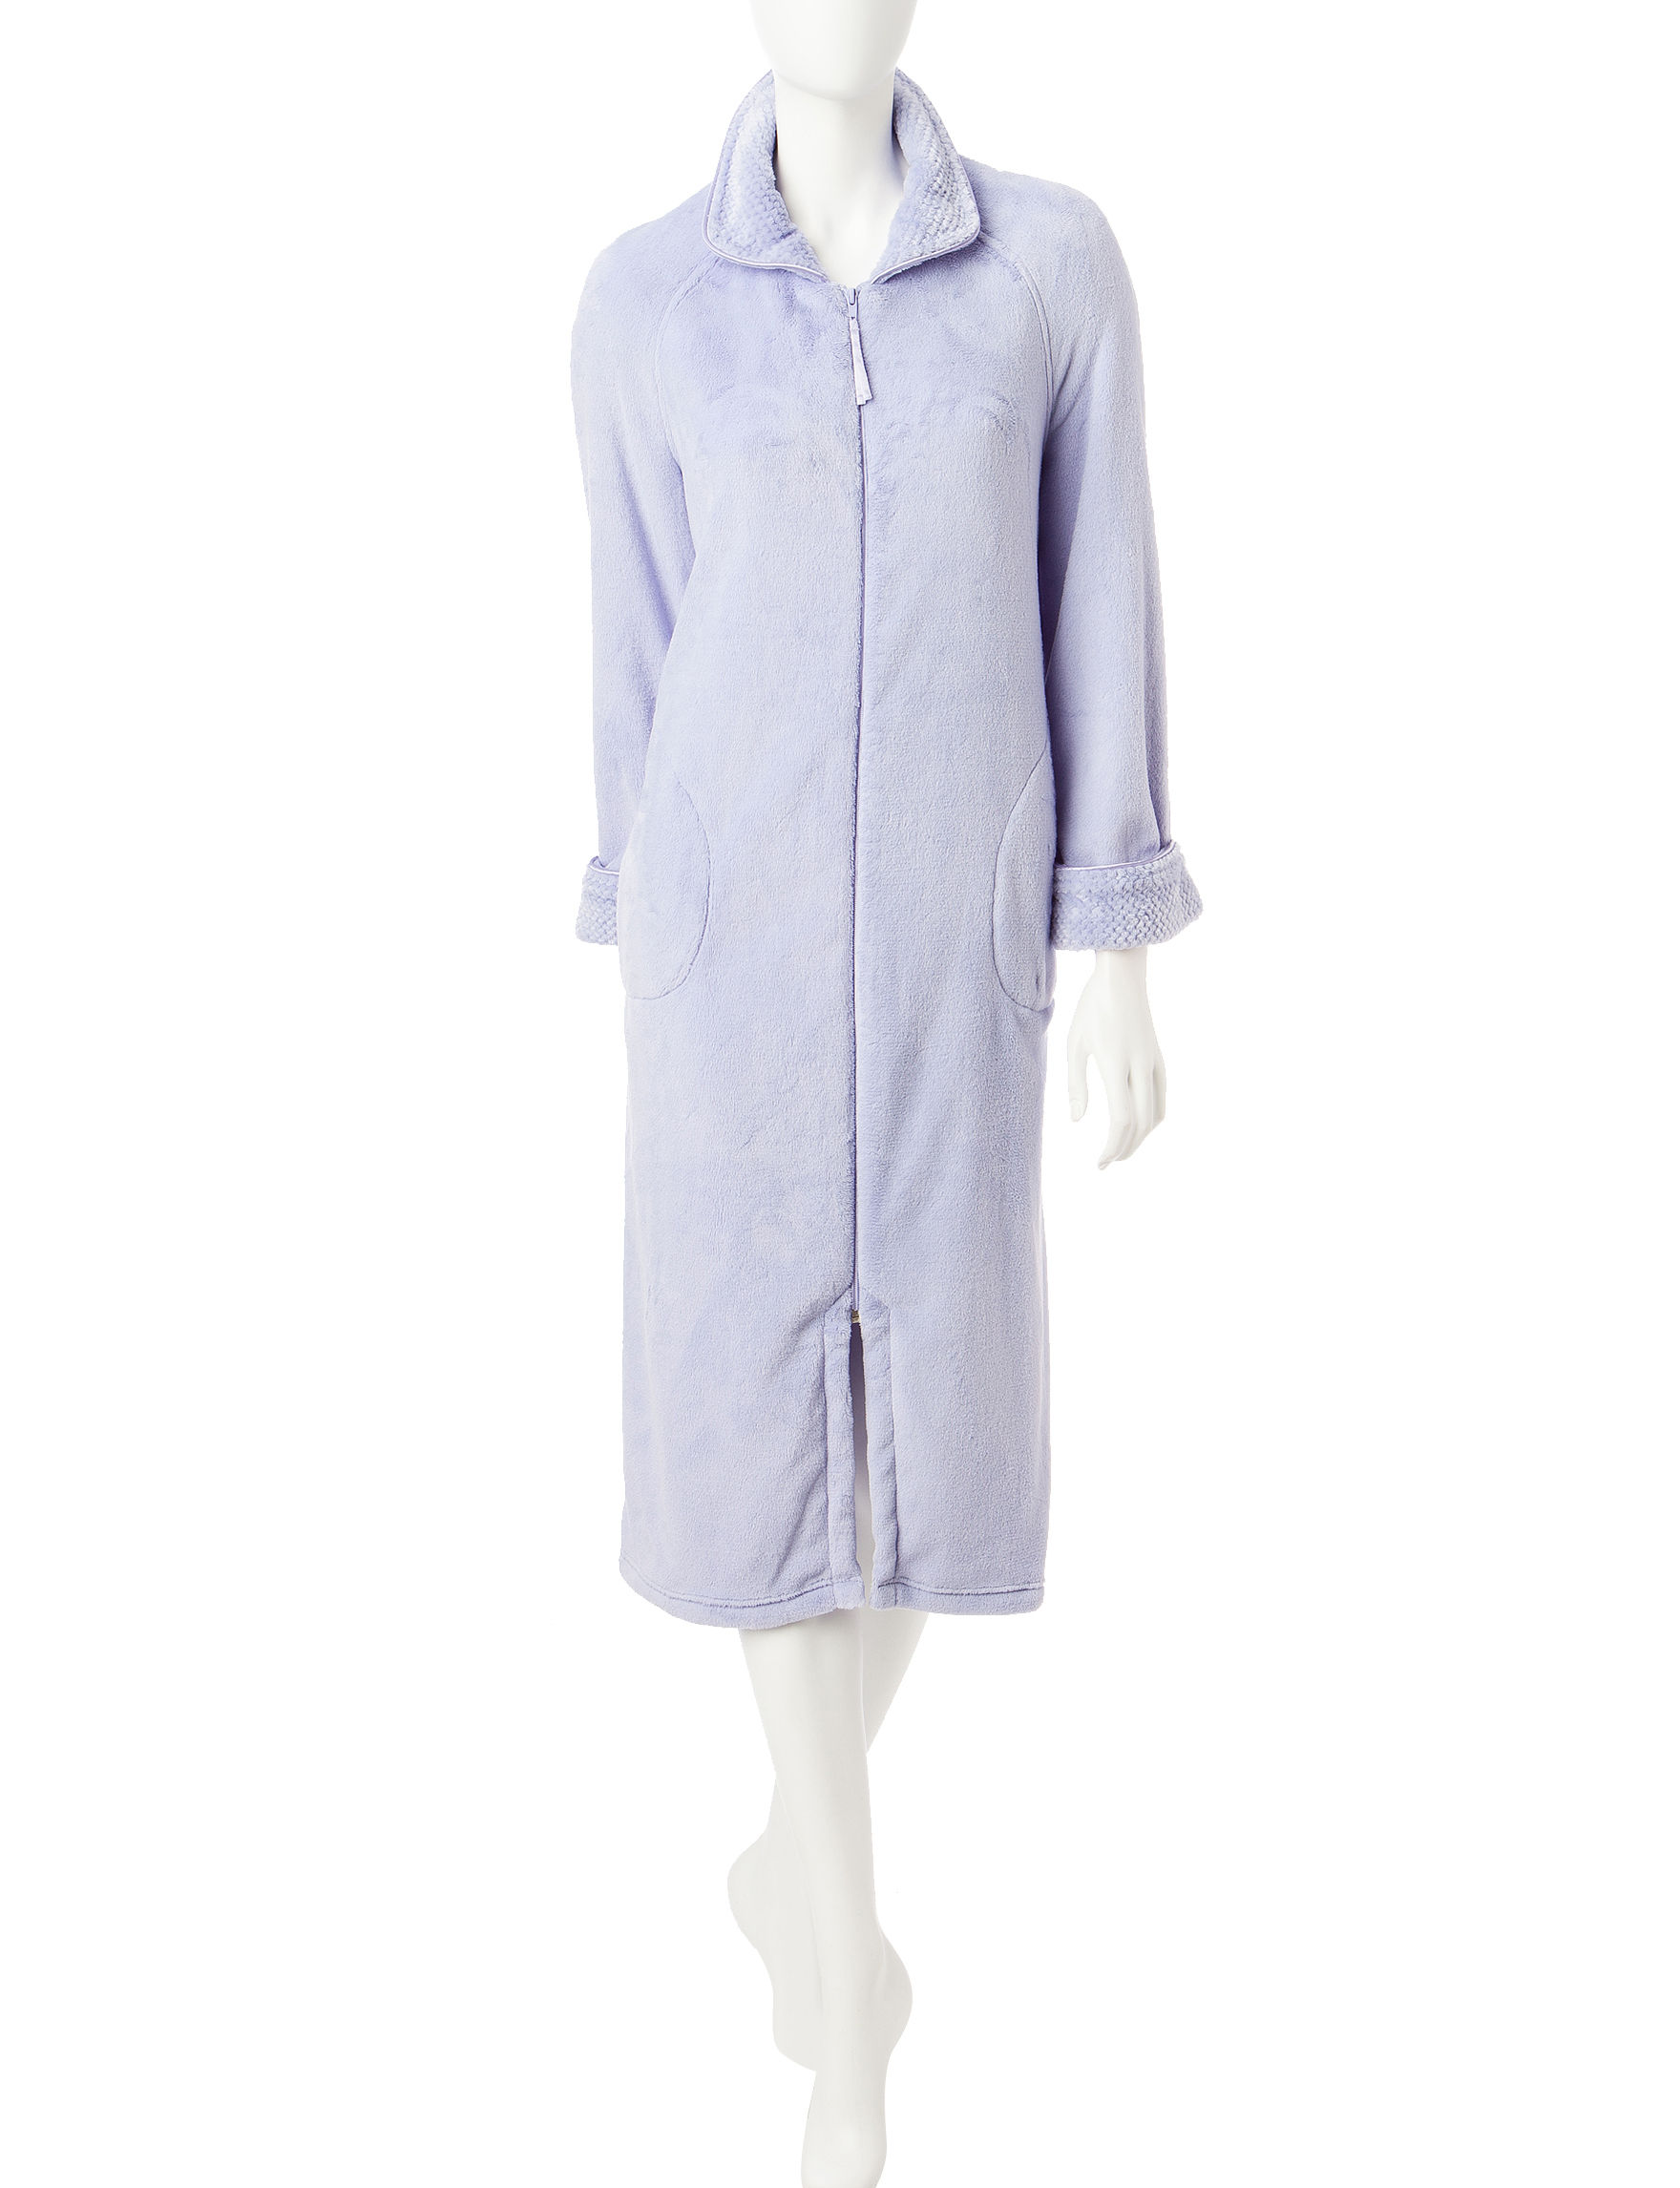 Rebecca Malone Lavender Robes, Wraps & Dusters